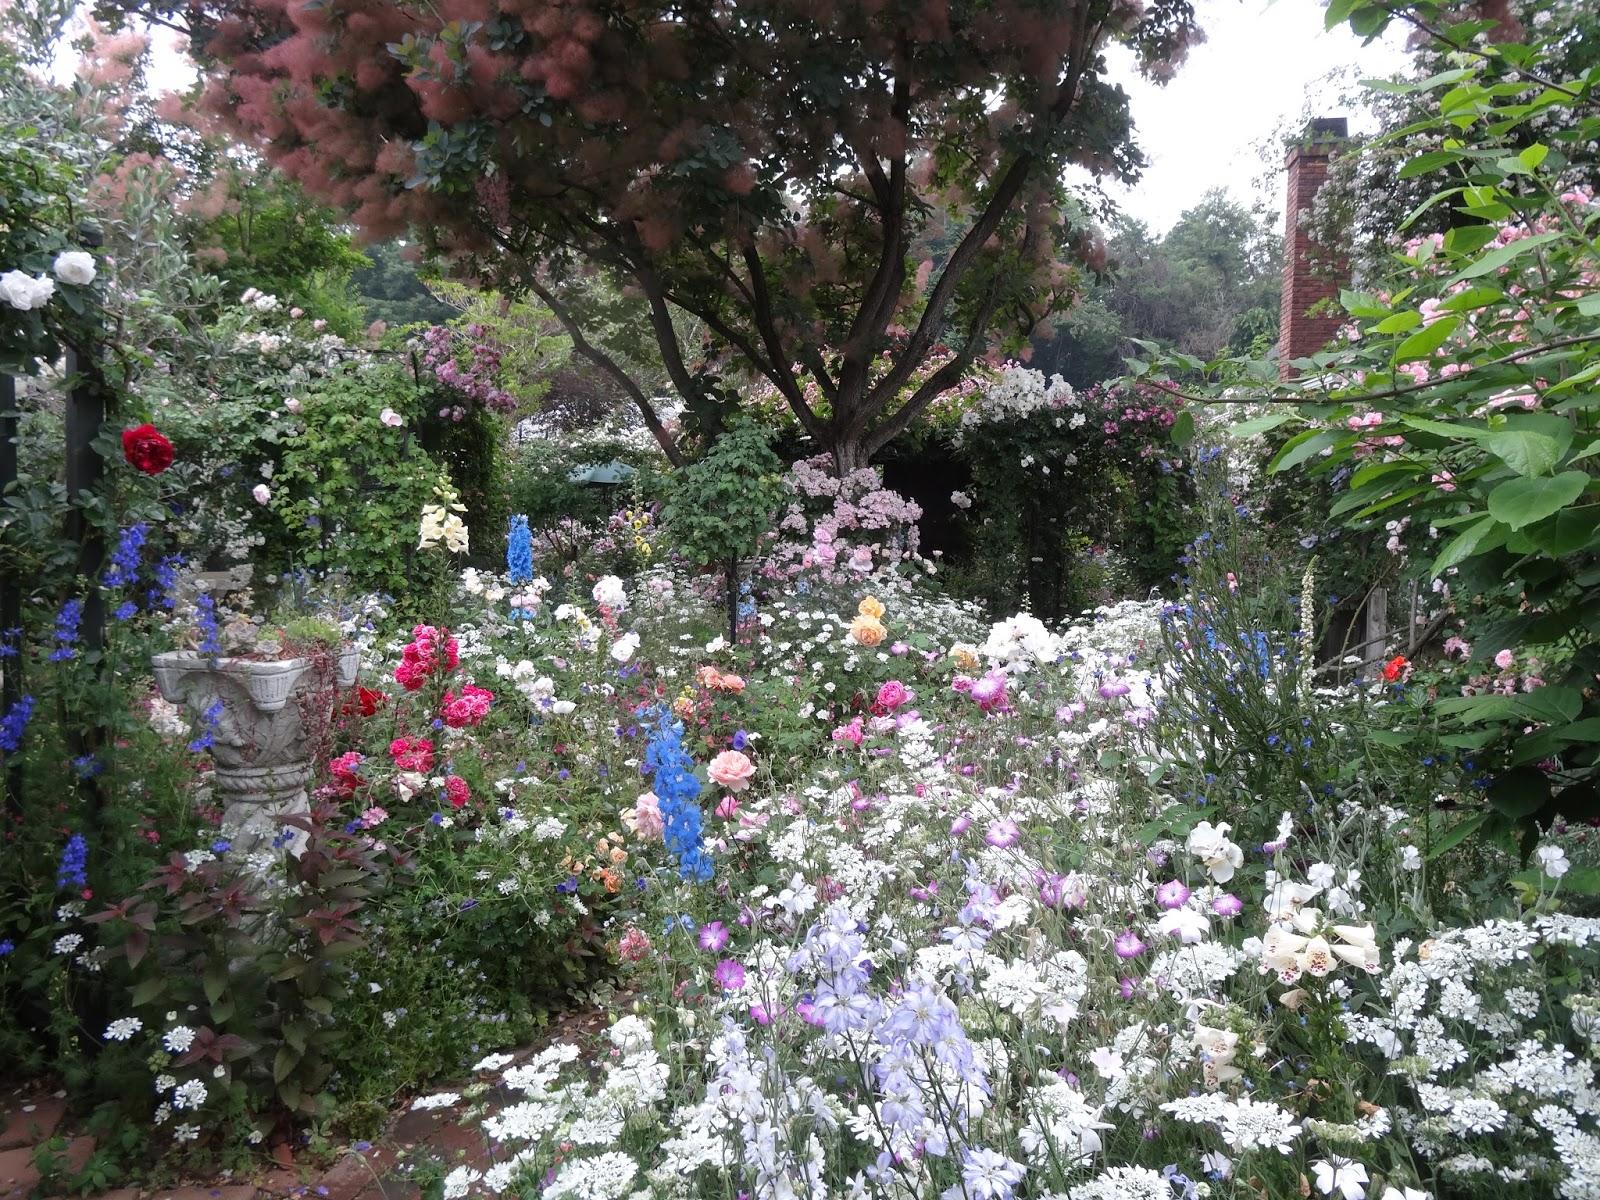 Le jardin secret 2015 for Akeo jardin secret 2015